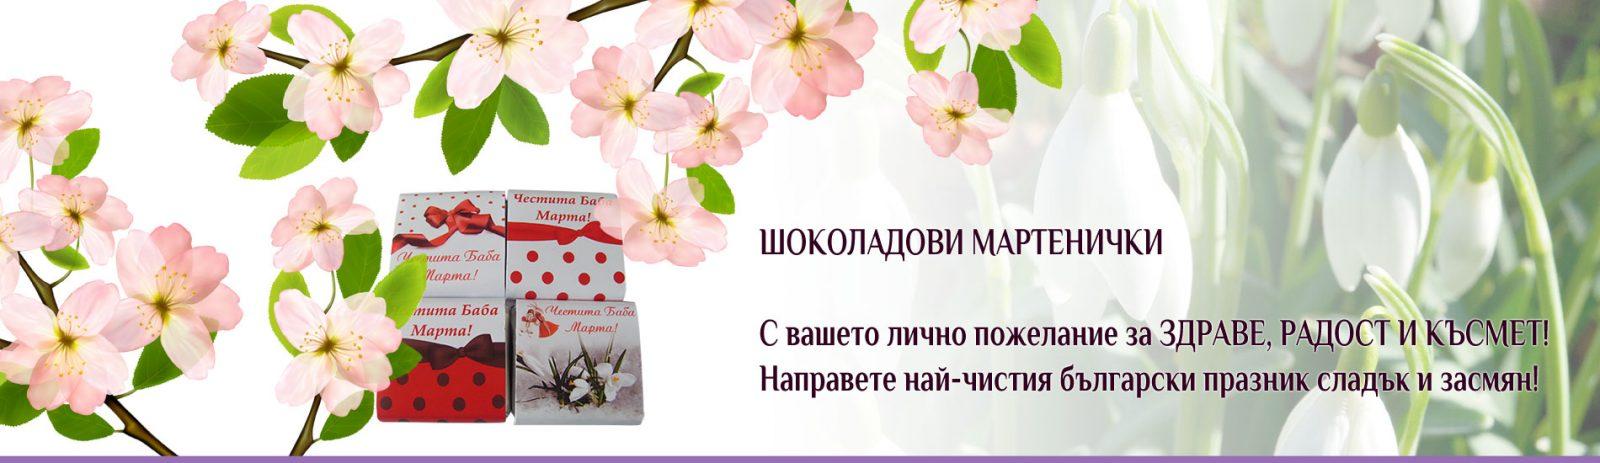 слайден Баба Марта mart-1